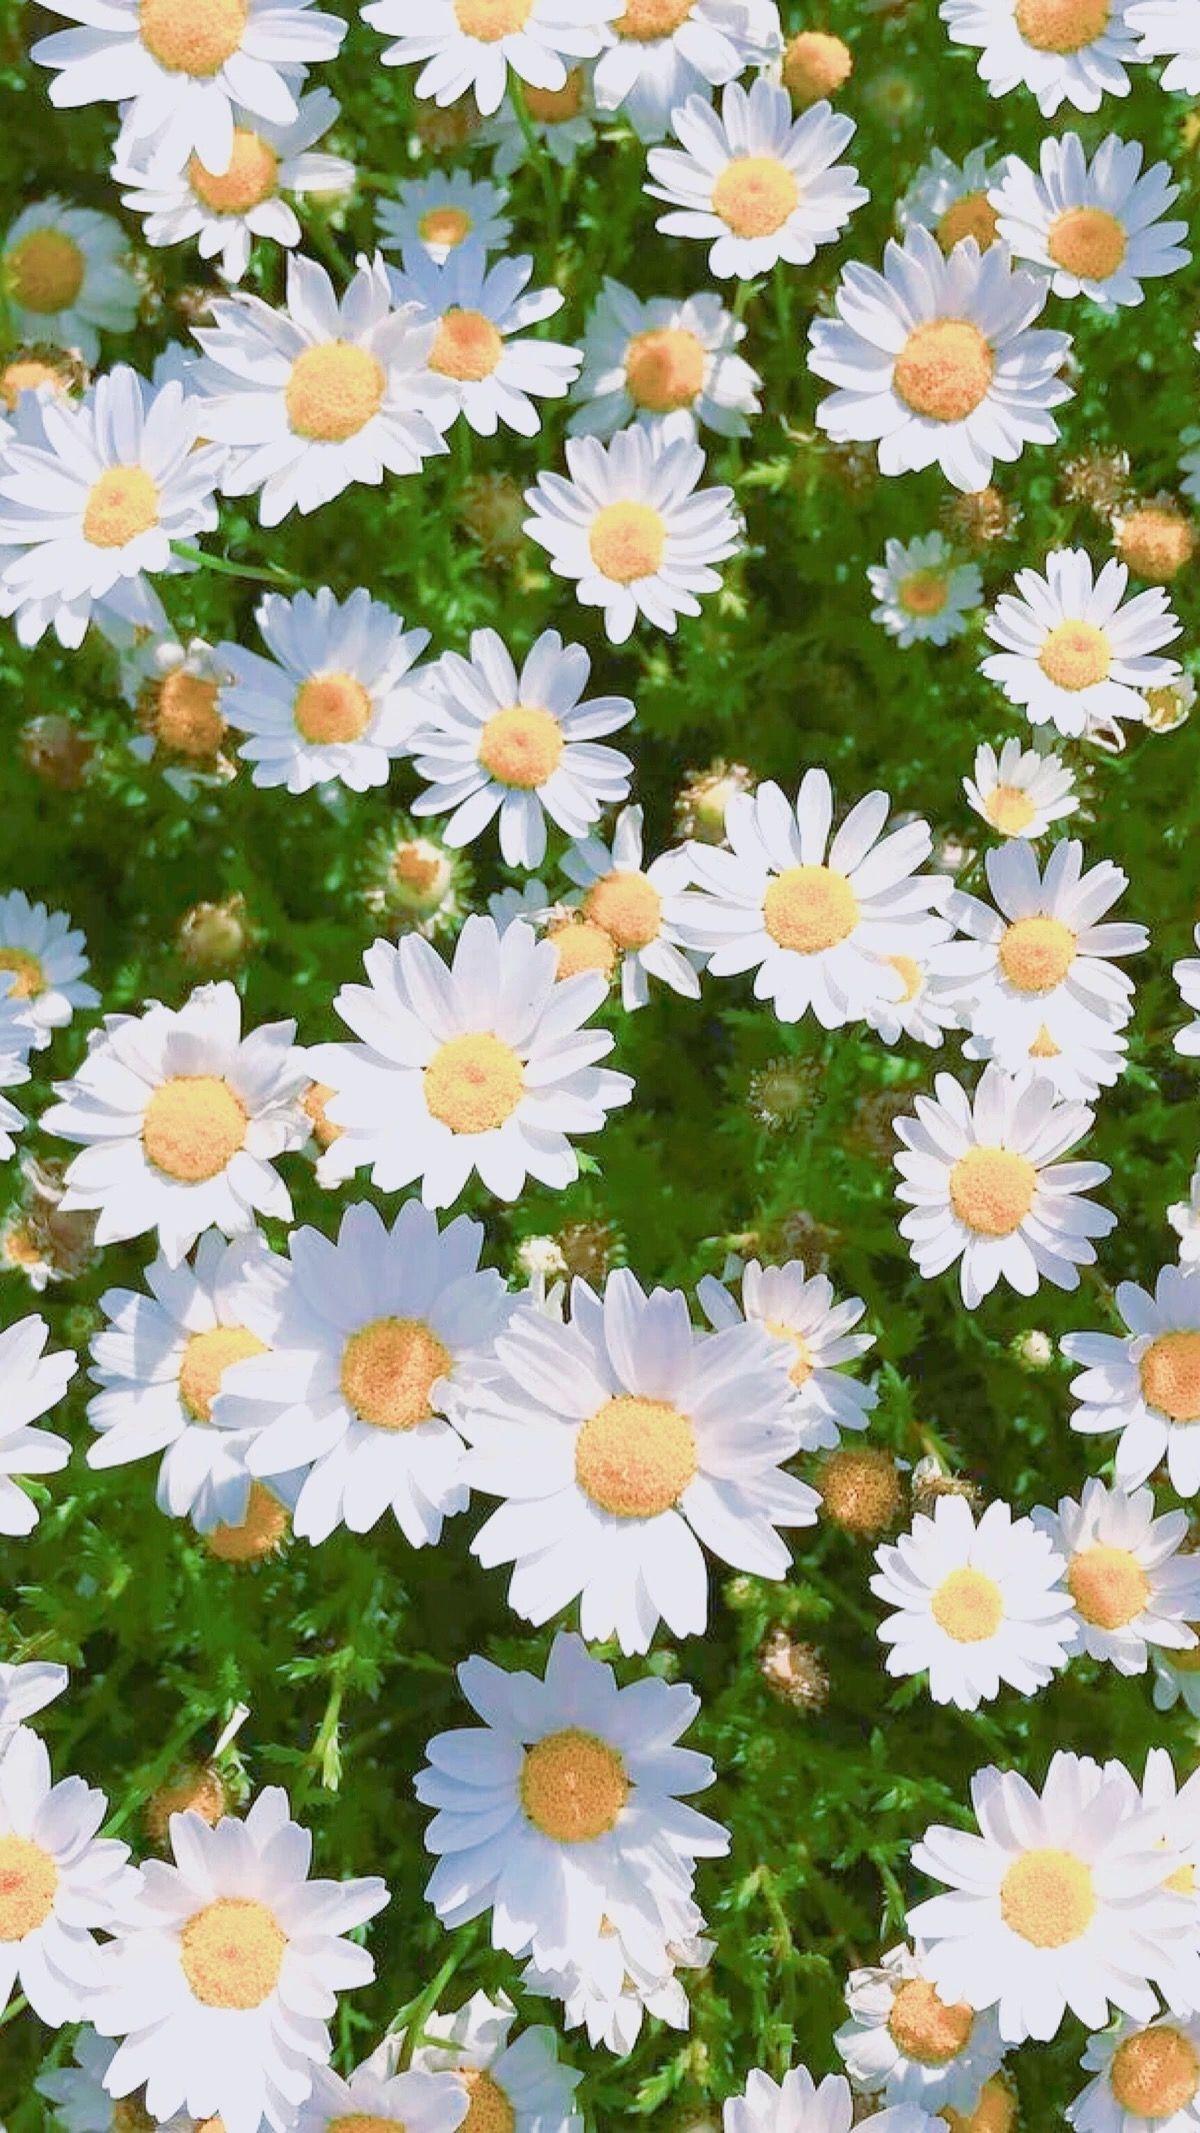 daisies - daisy - flowers - white - colours - wallpaper - tumblr